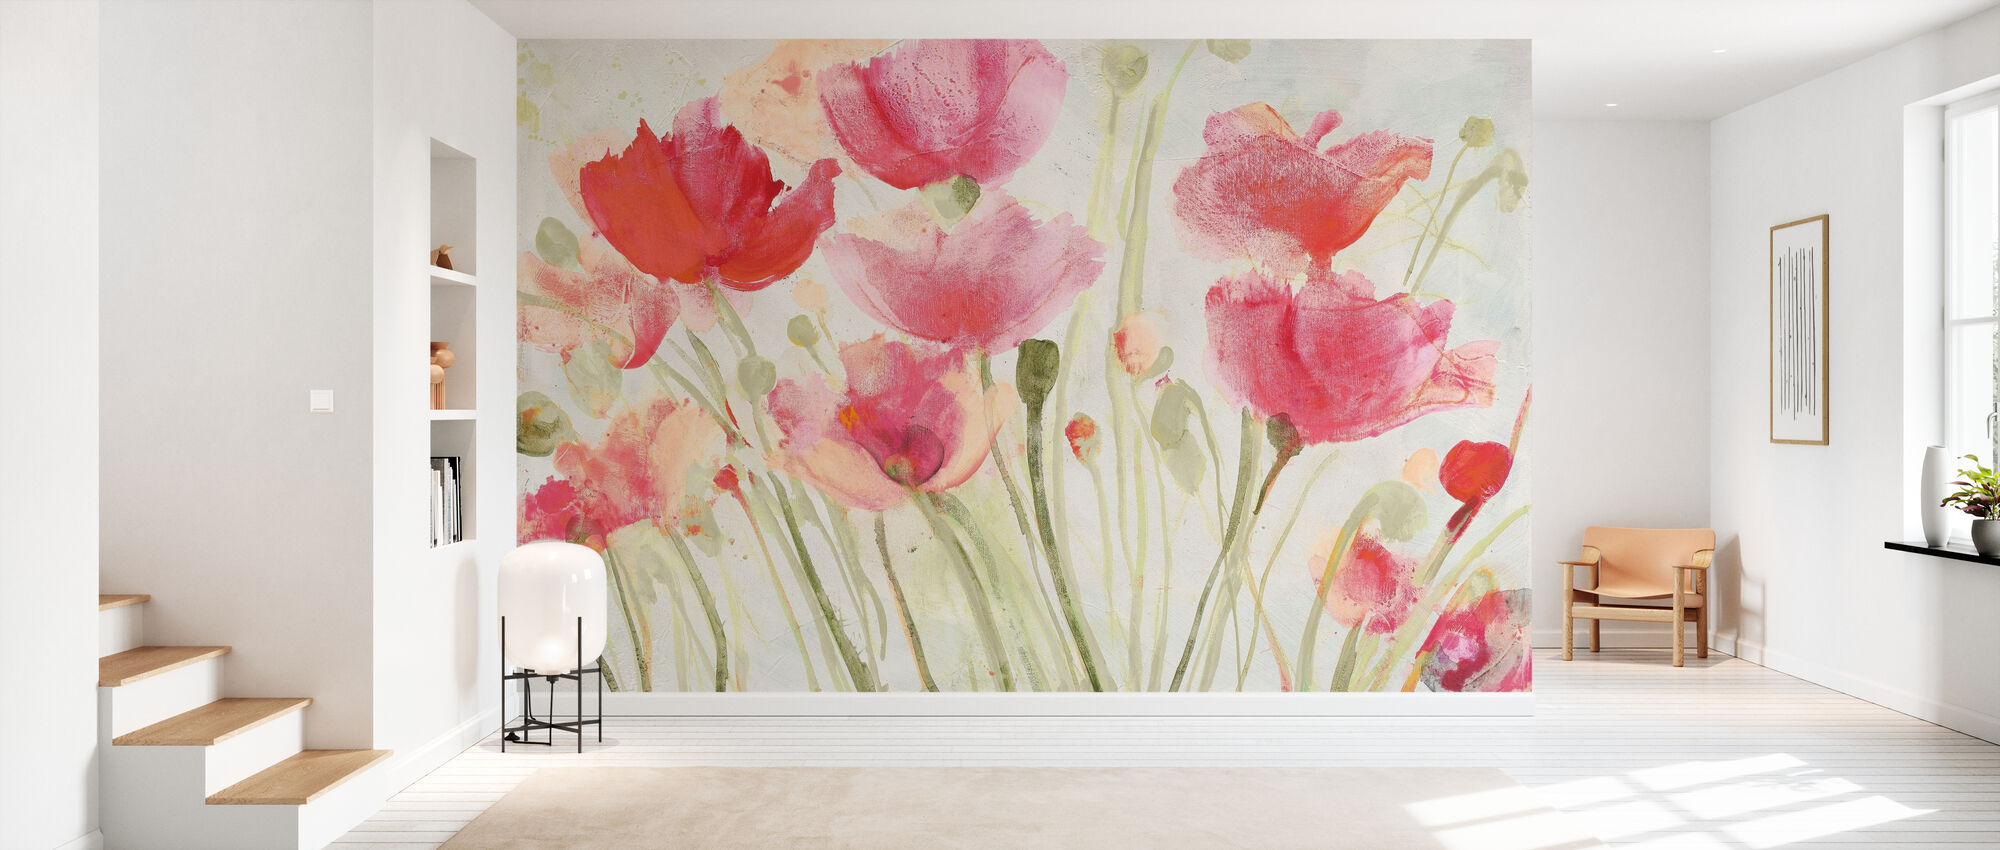 Blush Poppies - Wallpaper - Hallway